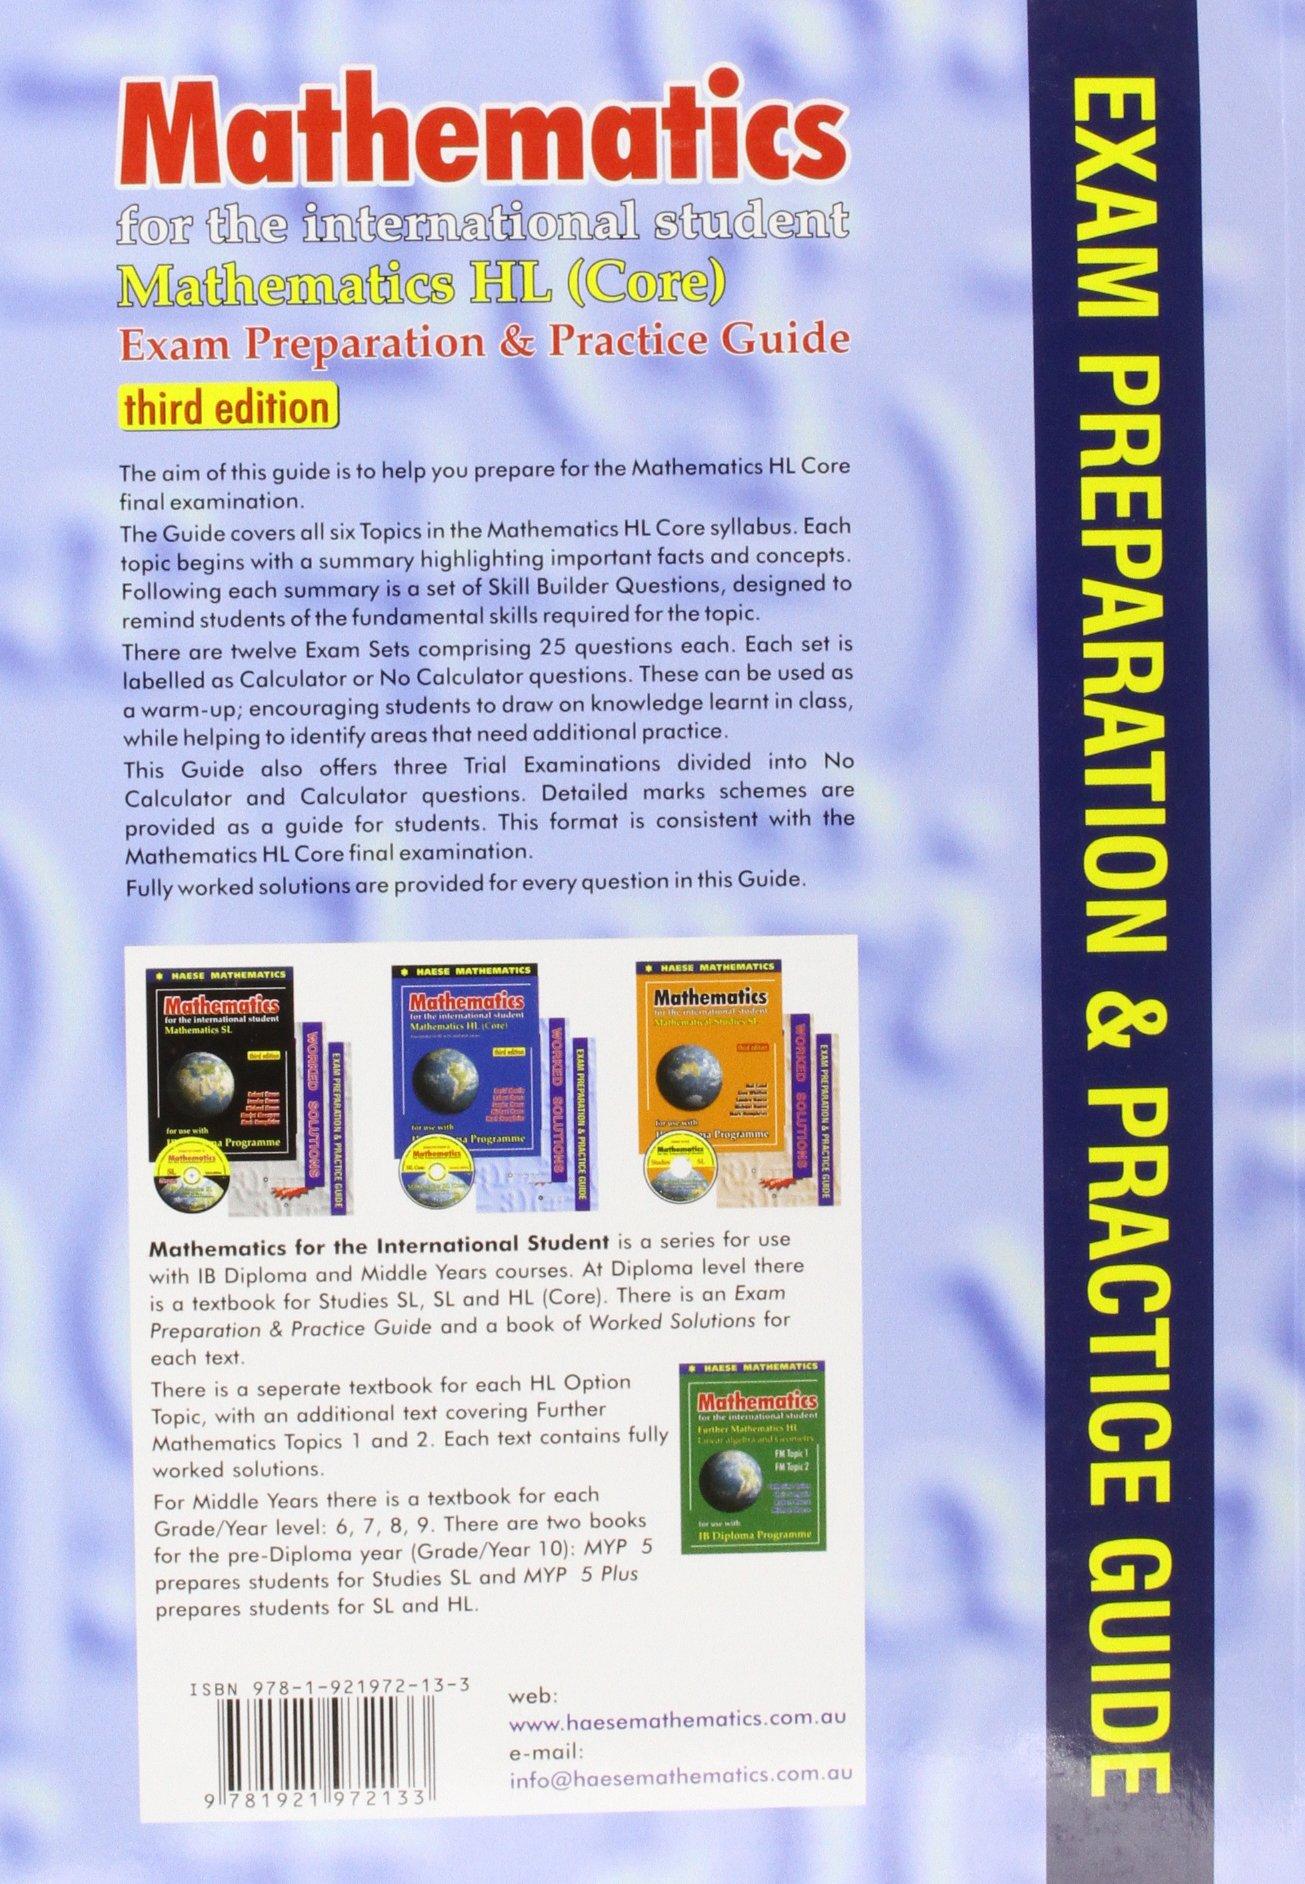 MATHEMATICS FOR THE INTERNATIONAL STUDENT: MATHEMATICS HL (CORE), 3RD / EXAM  PREPARATION & PRACTICE GUIDE: HAESE ET AL: 9781921972133: Amazon.com: Books